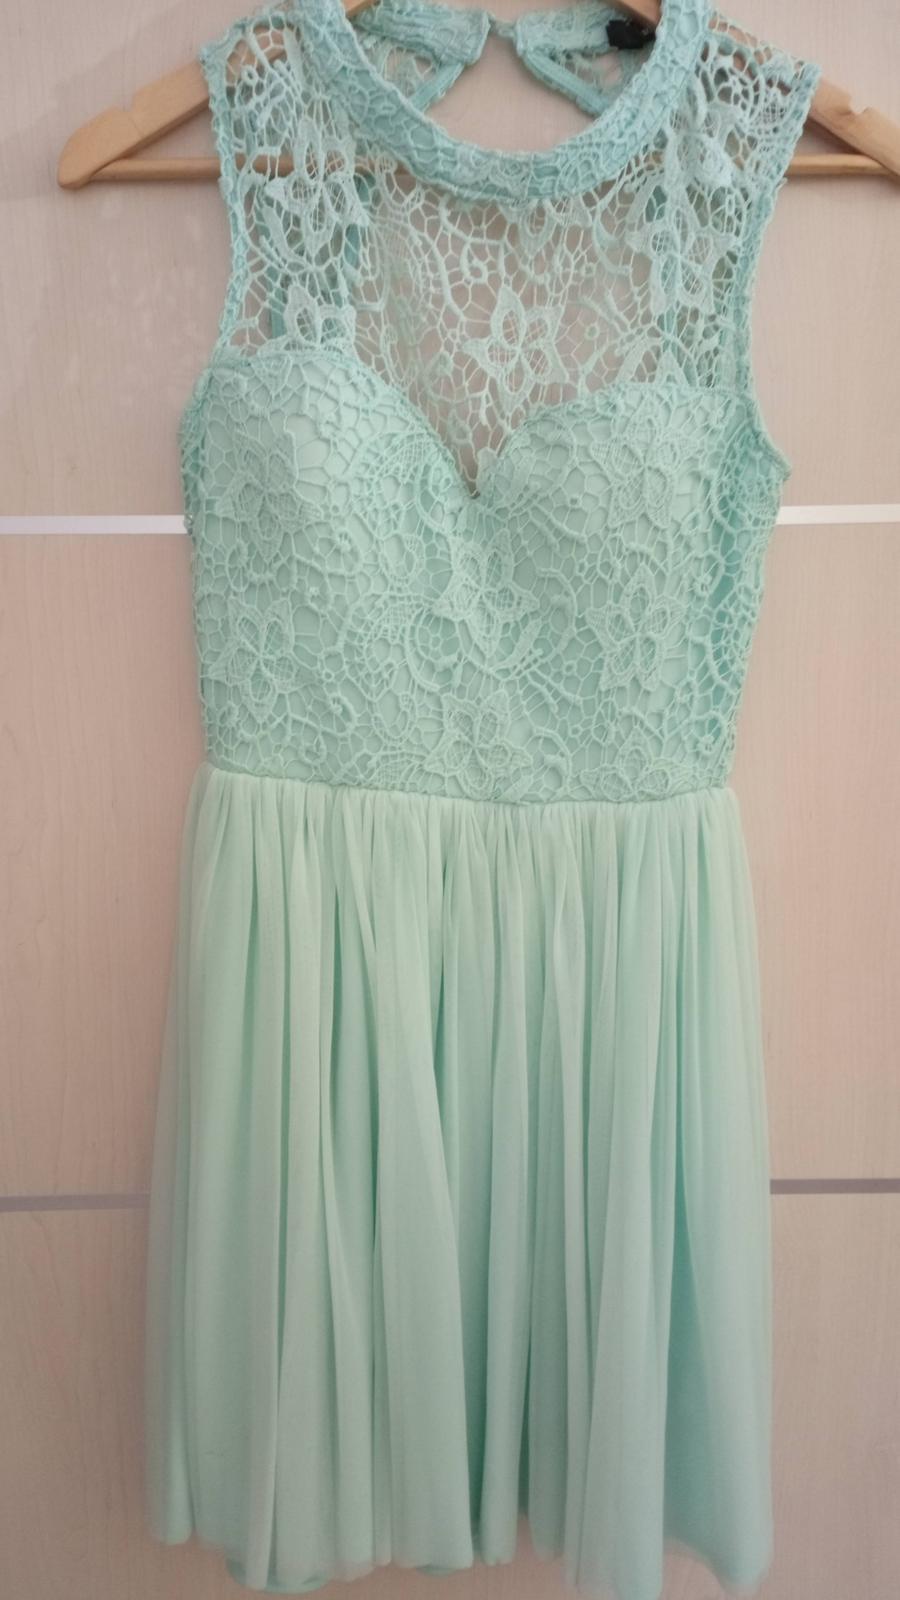 Letné šaty S - Obrázok č. 1